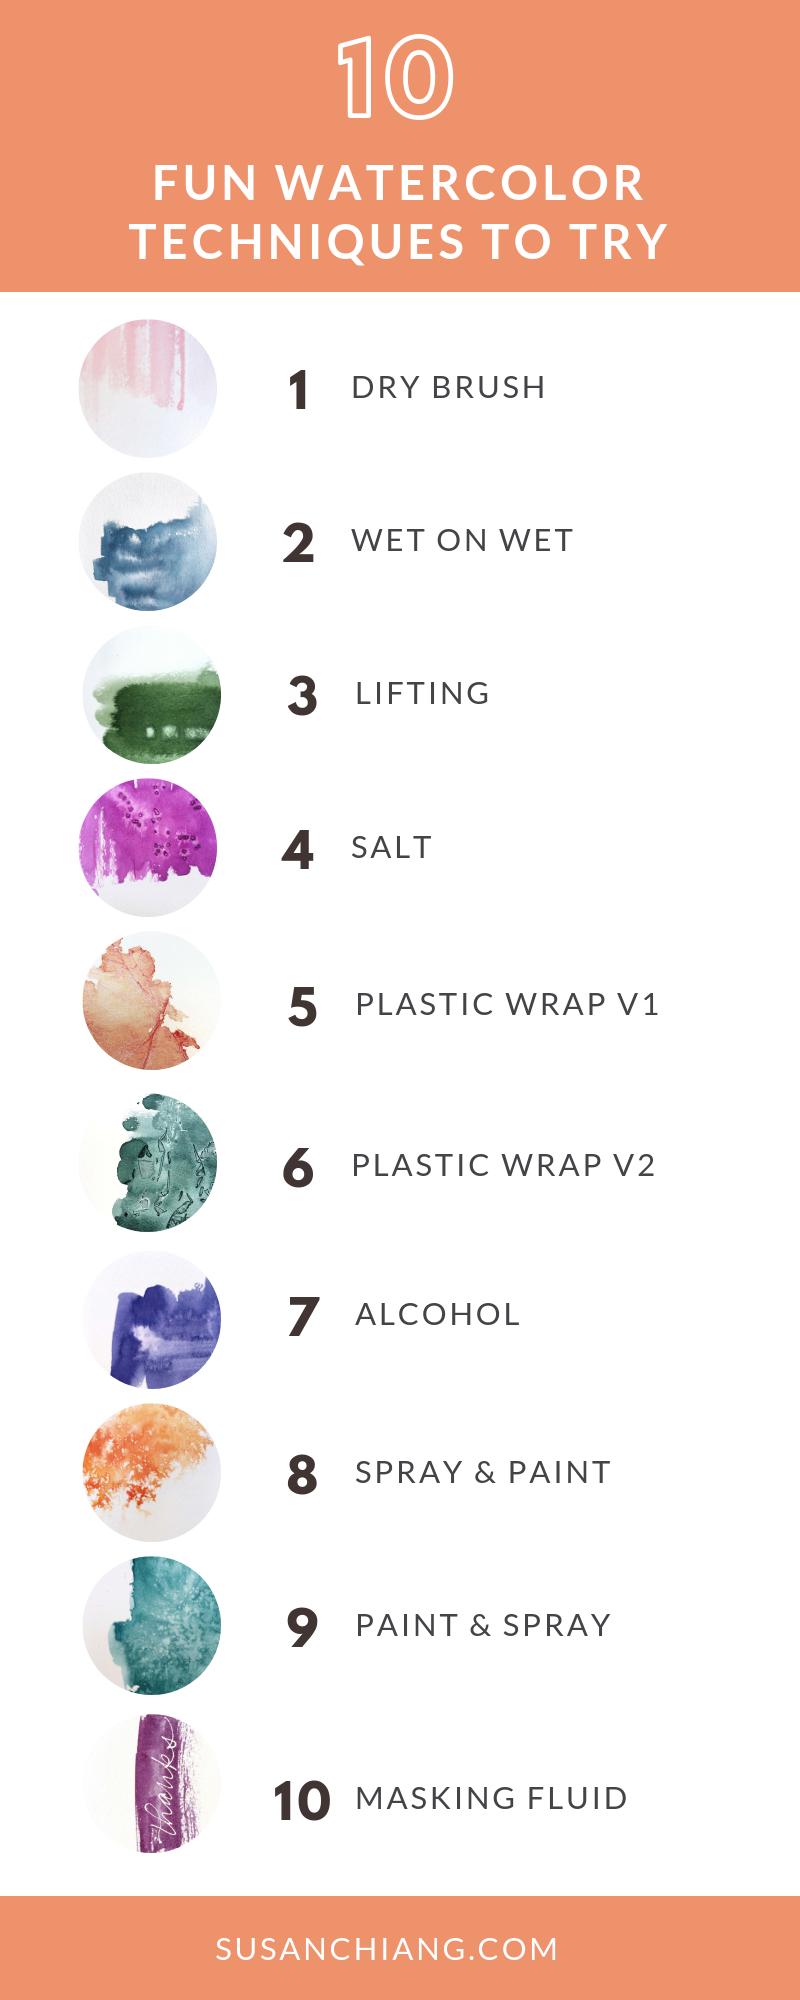 10 Fun Watercolor Techniques.png